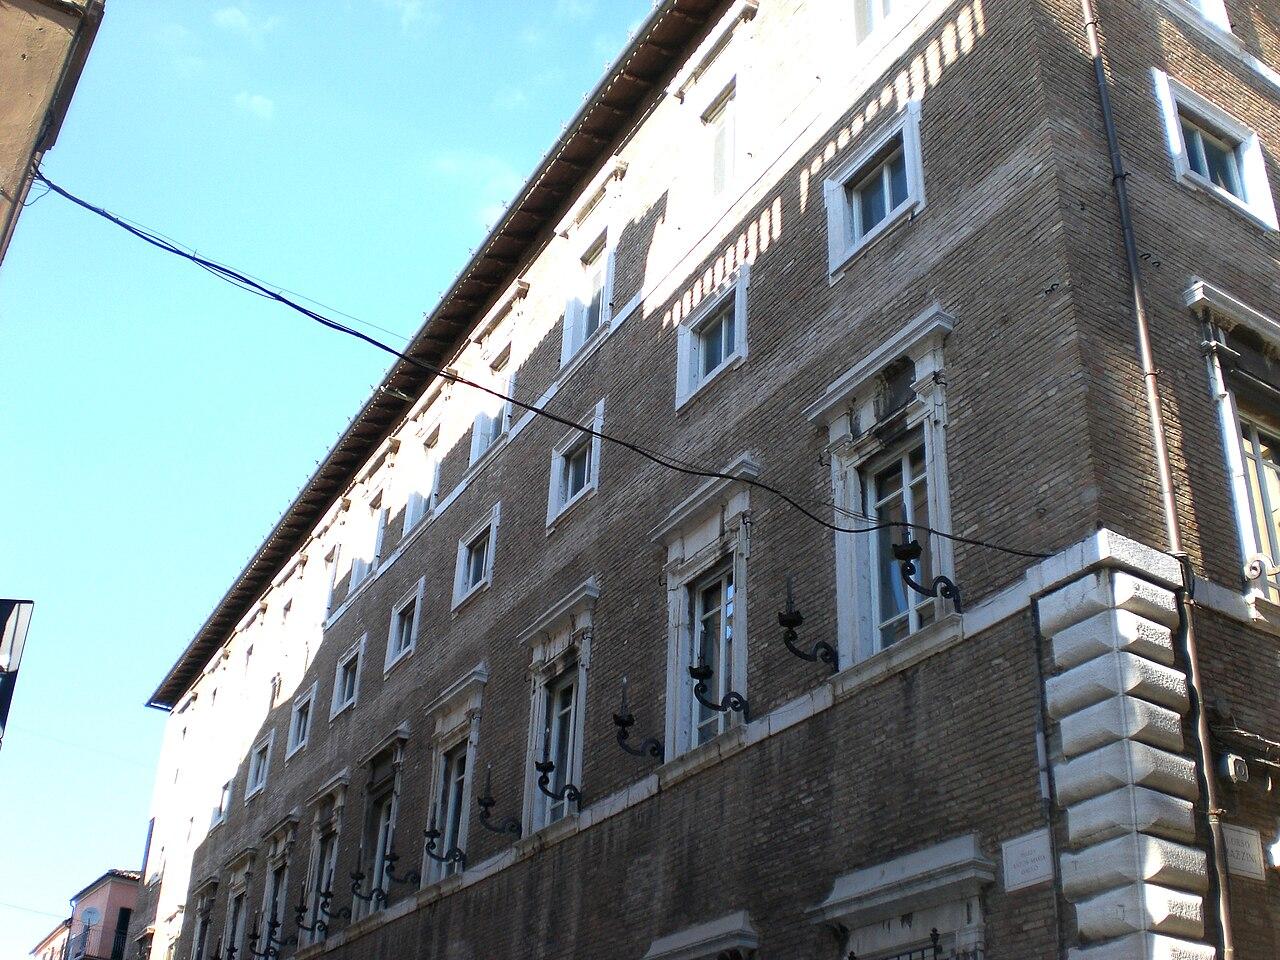 Ficheiro osimo palazzo wikipedia a for Palazzo 24